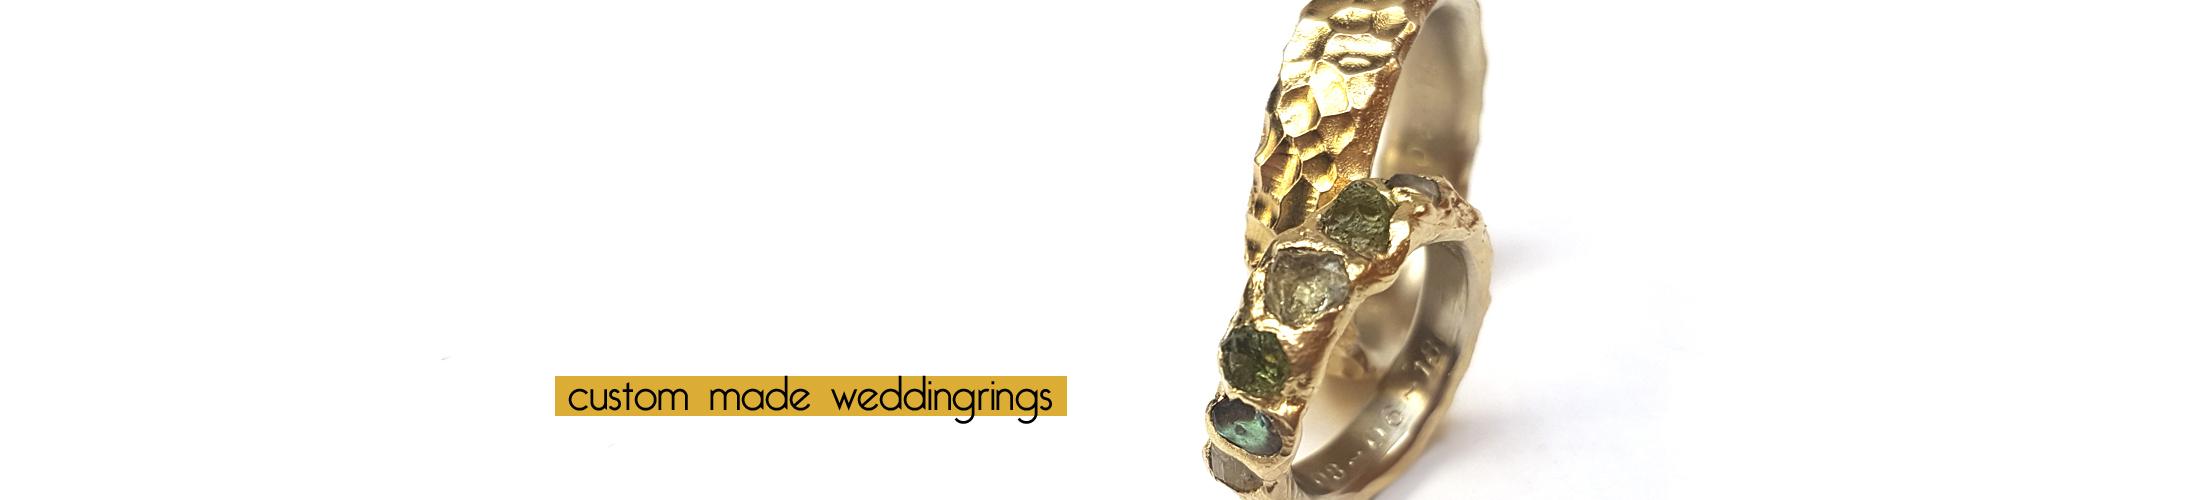 custom made weddingrings